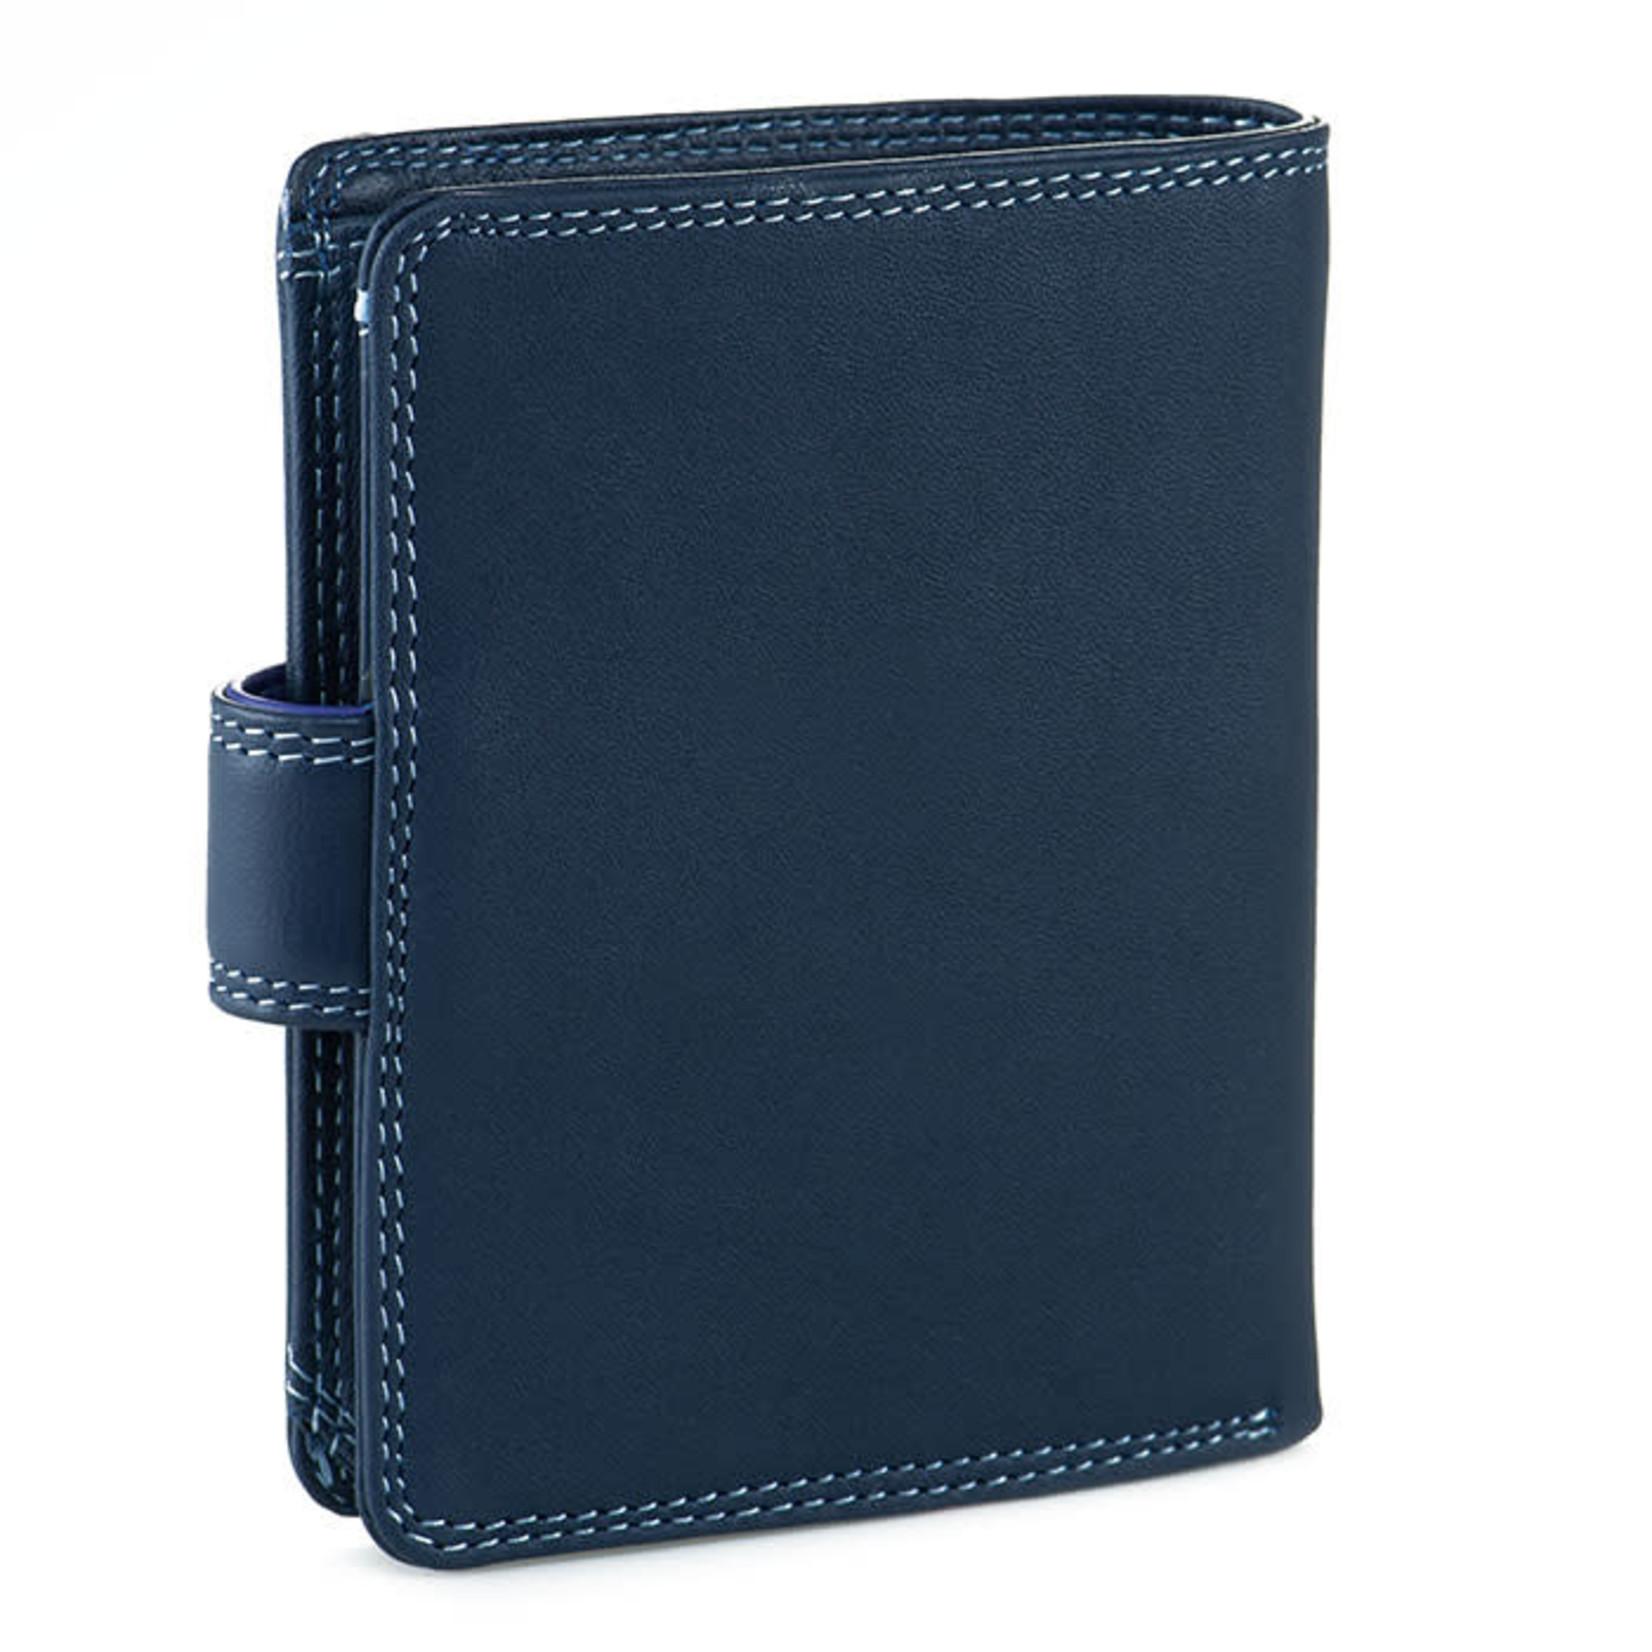 MyWalit Tri Fold Tab Wallet Royal